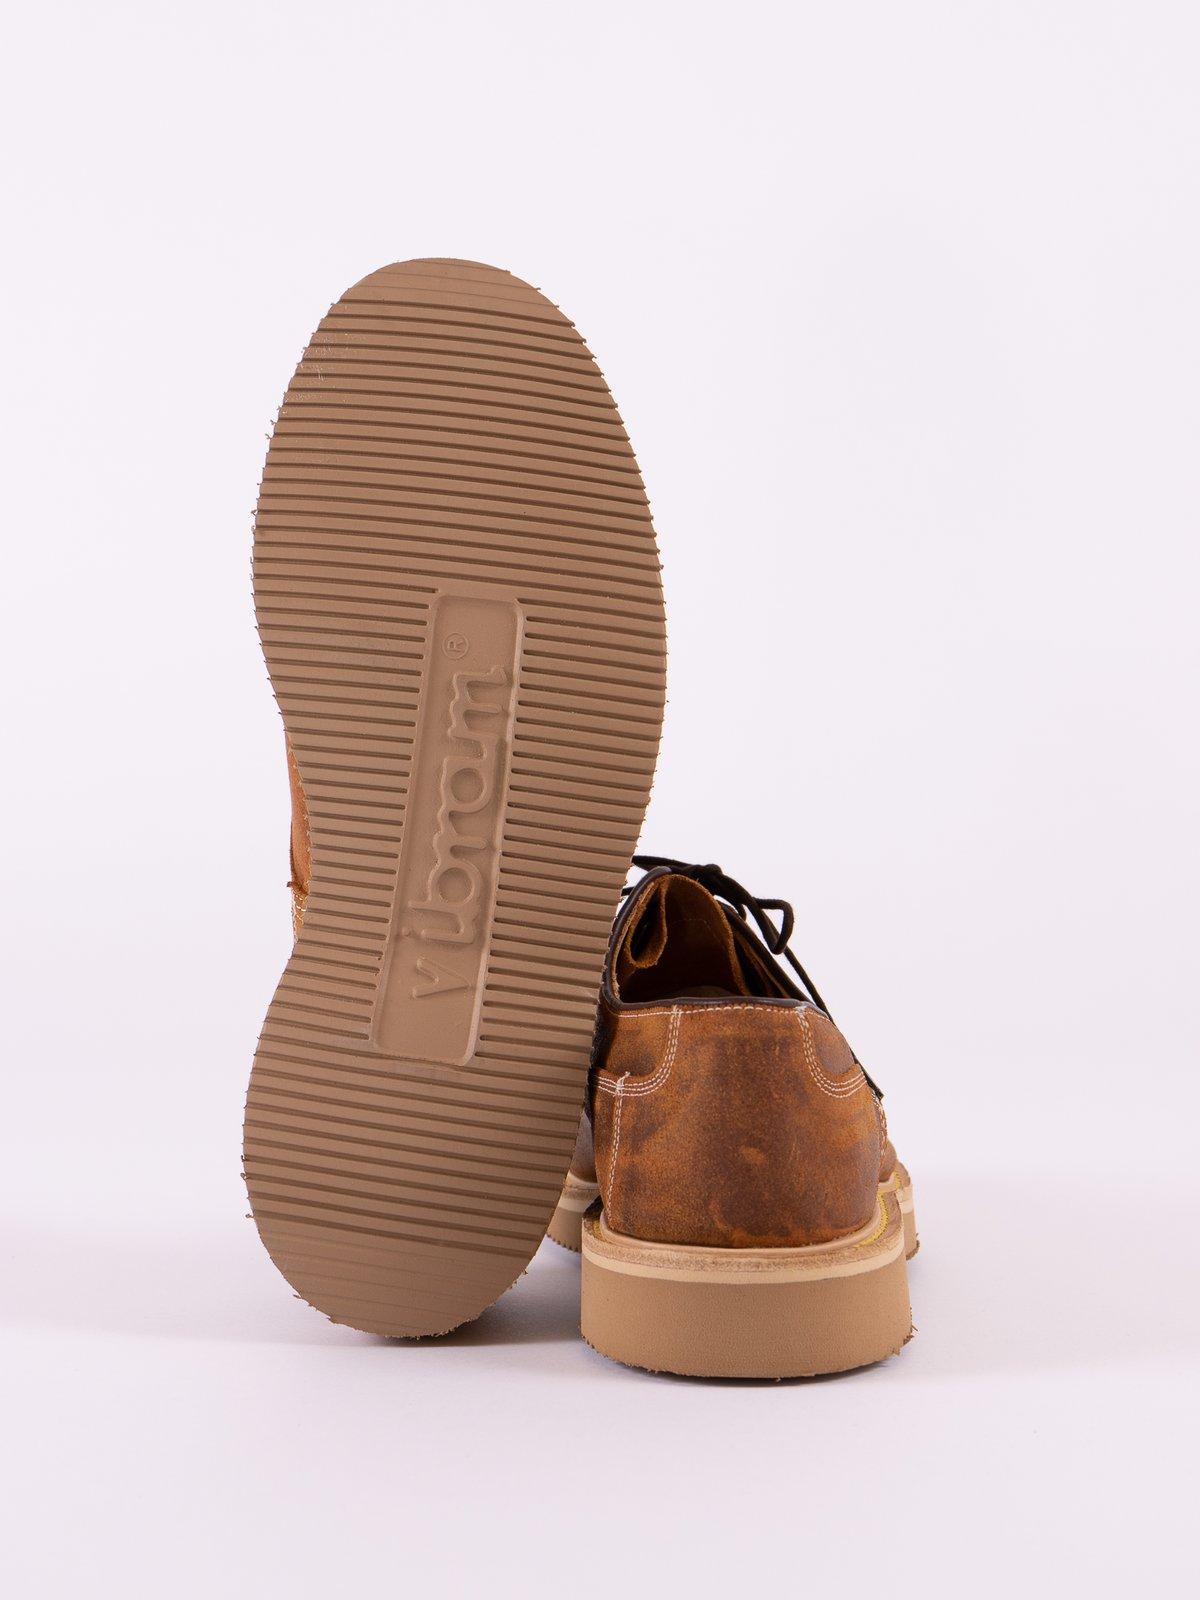 Waxy Cuba TBB Service Shoe - Image 6